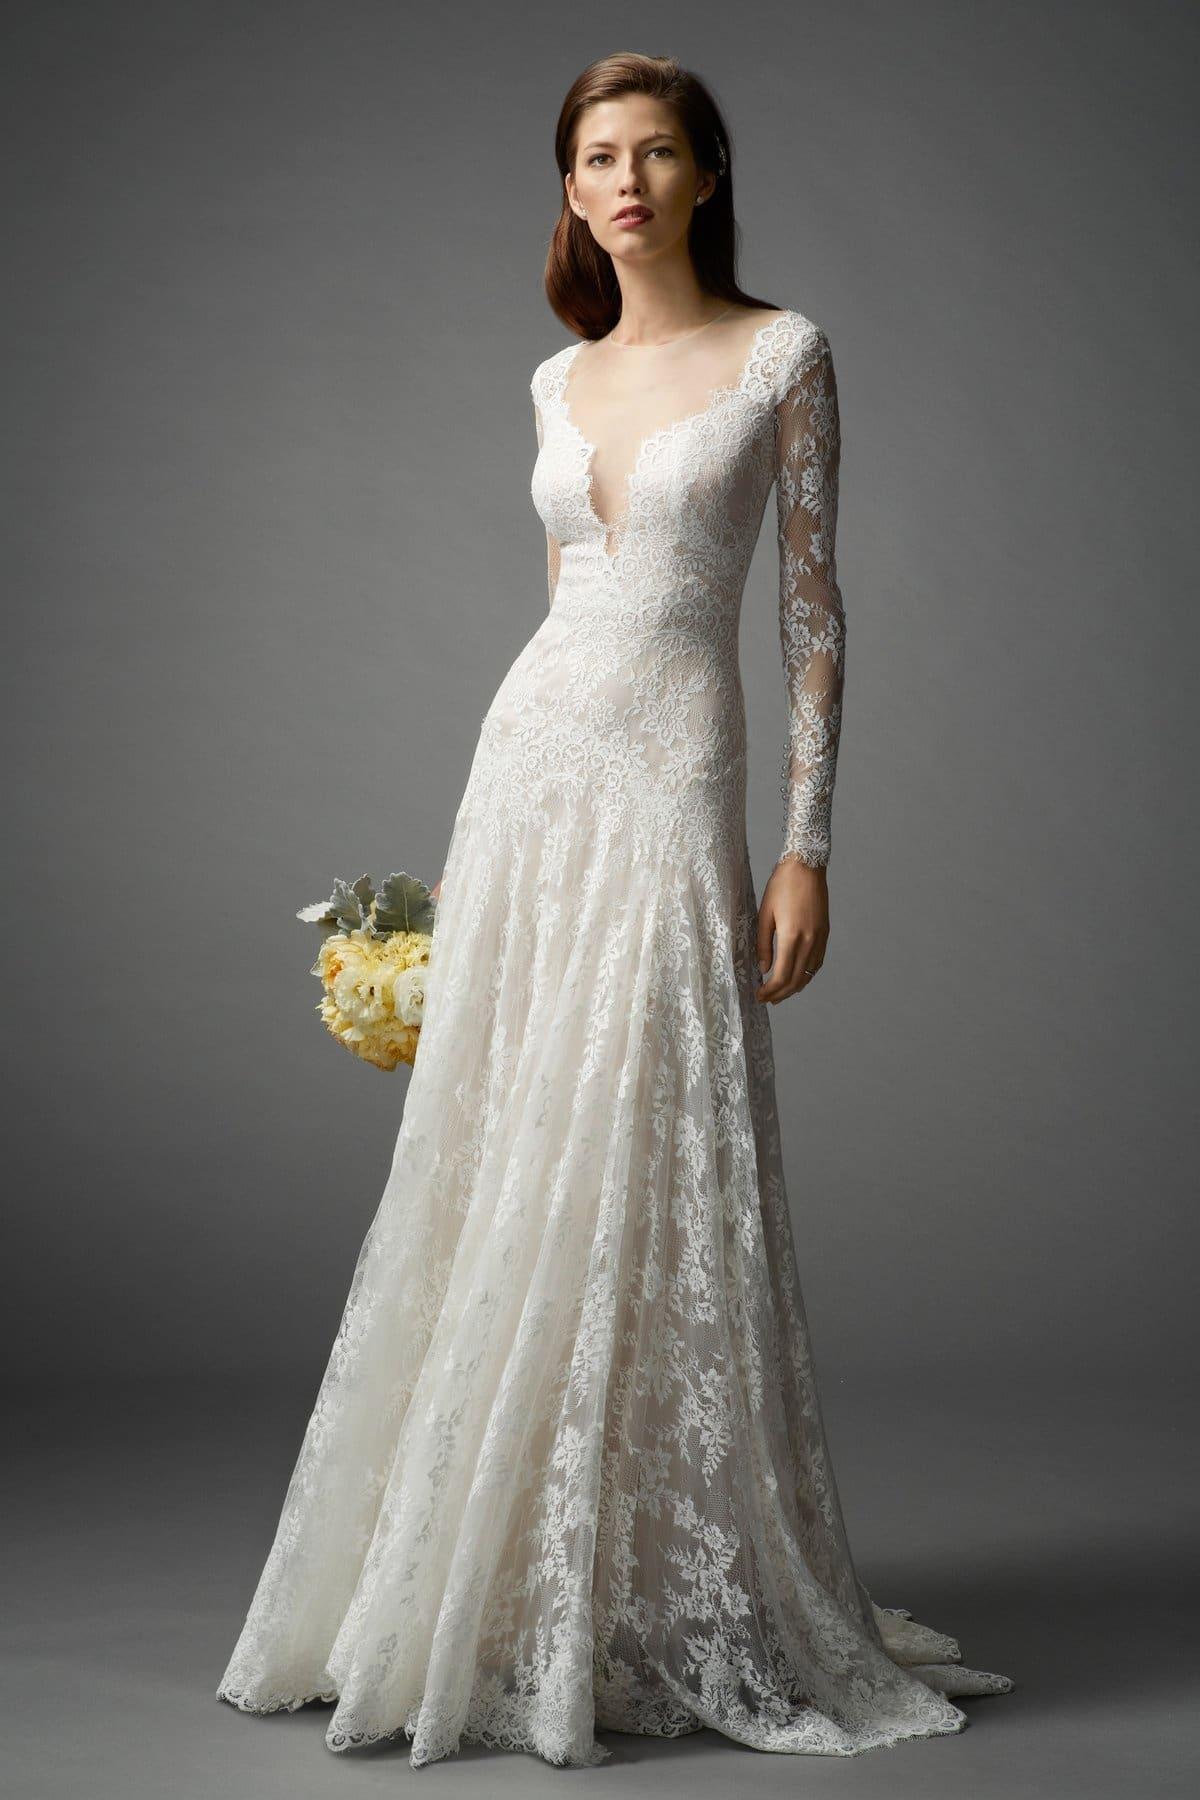 Long Sleeved Wedding Dresses We Love